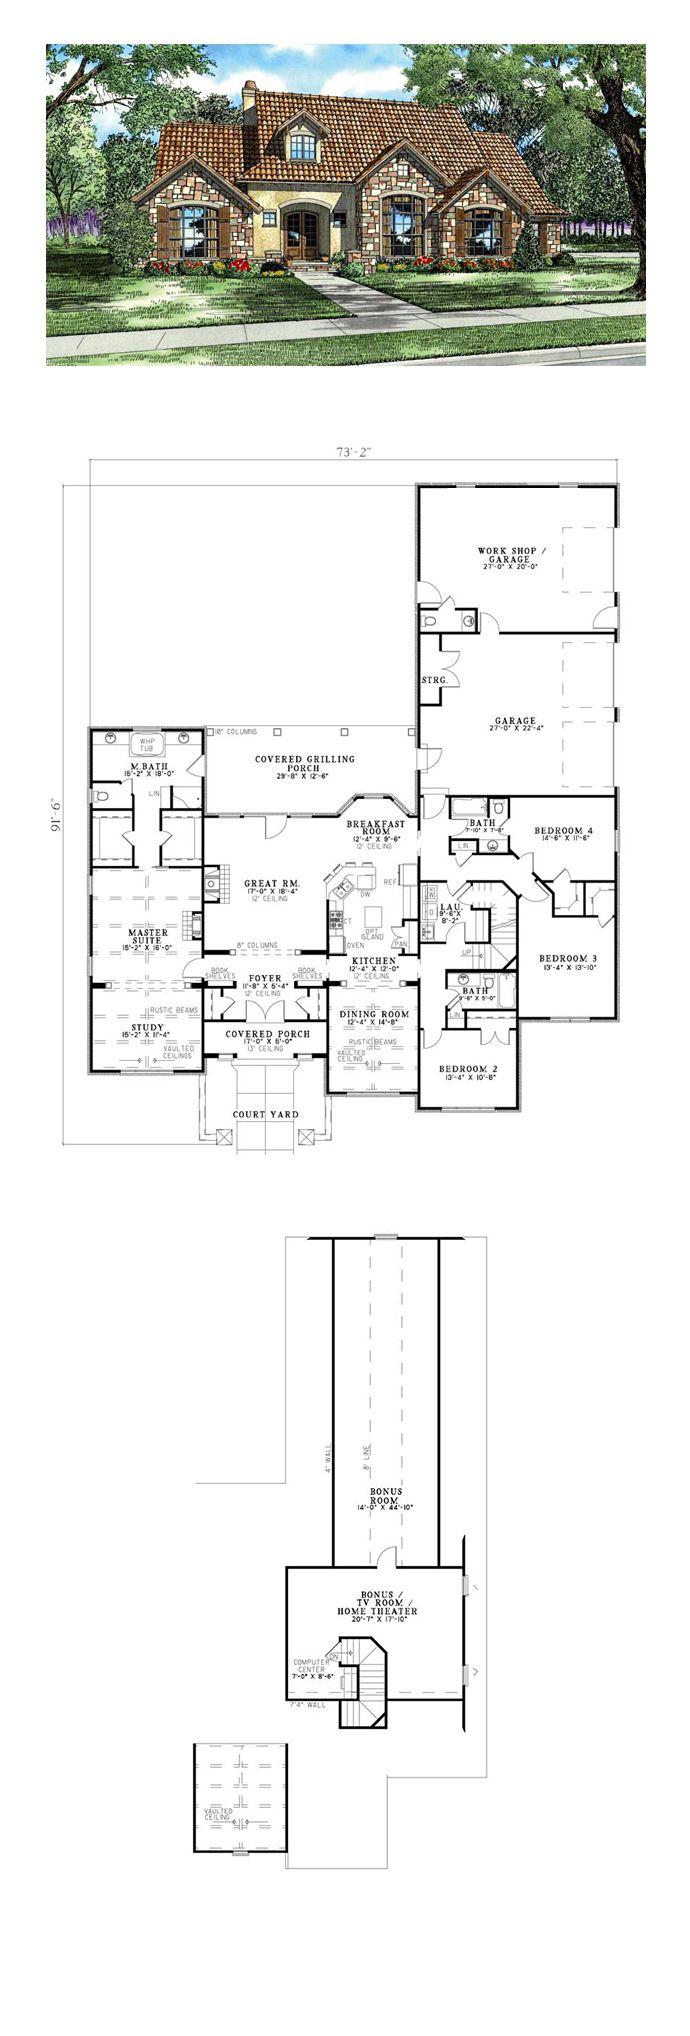 best 25 tuscan house plans ideas only on pinterest italian mediterranean tuscan house plan 82118